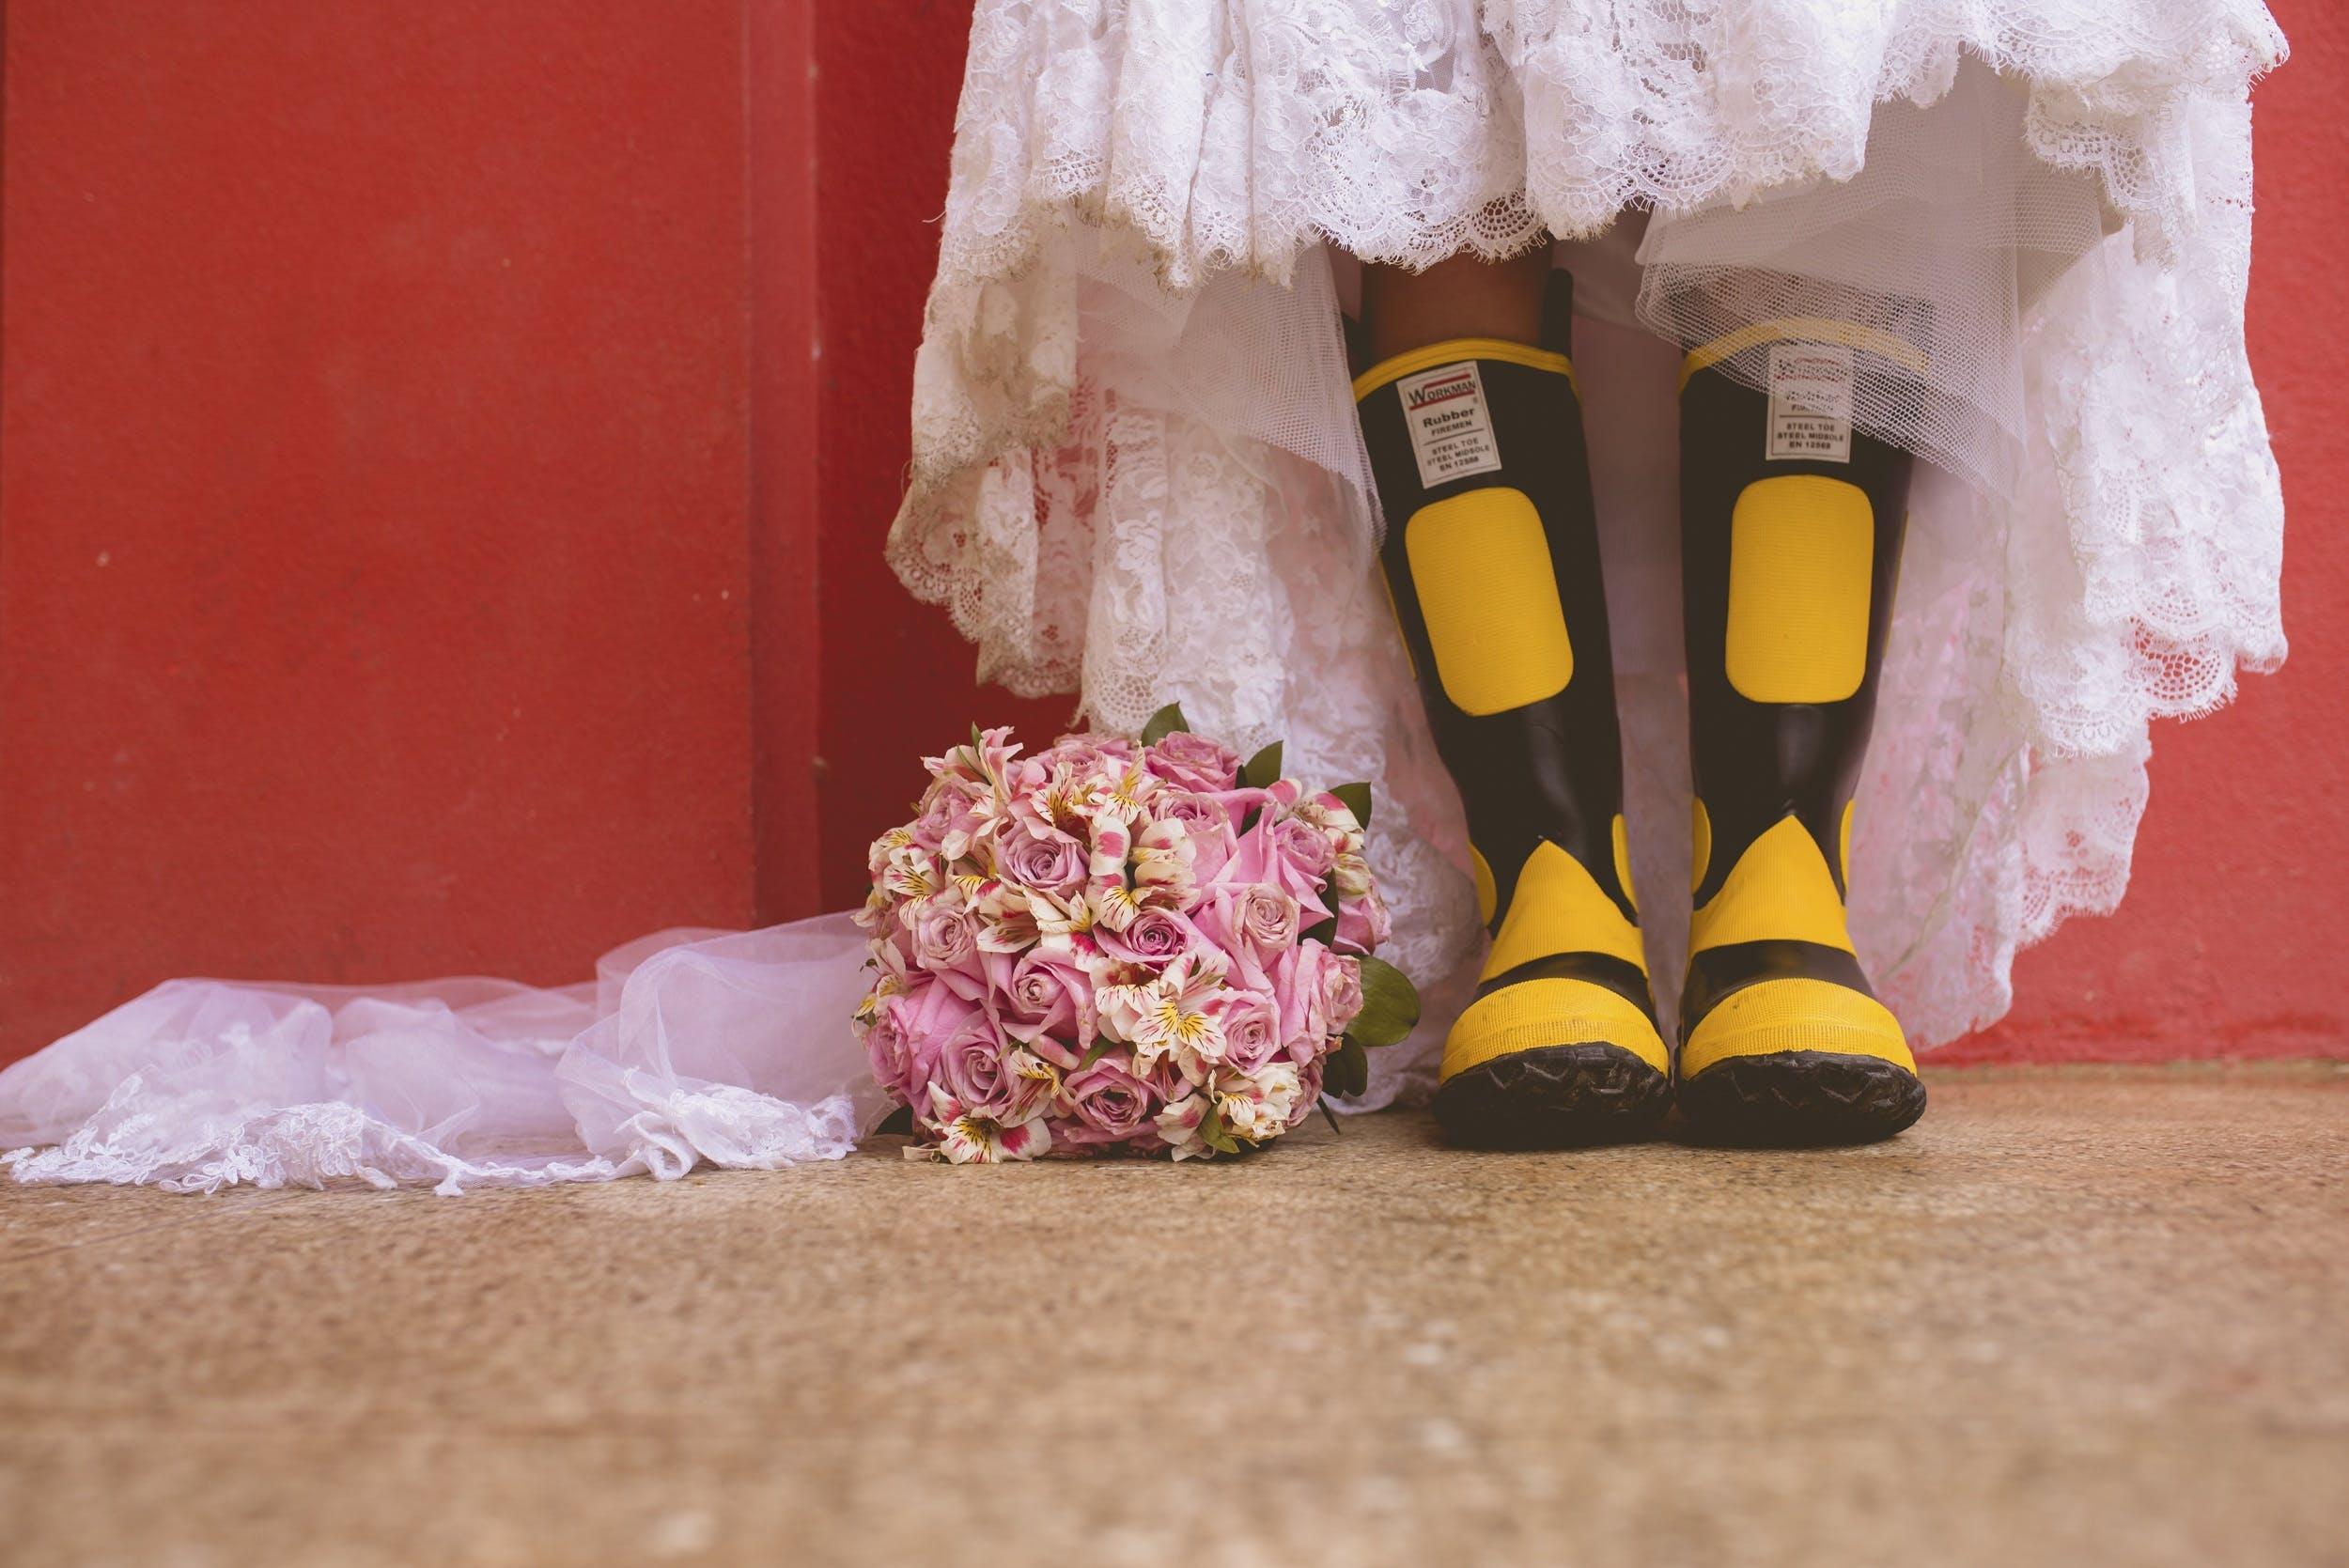 Yellow-and-black Rain Boots